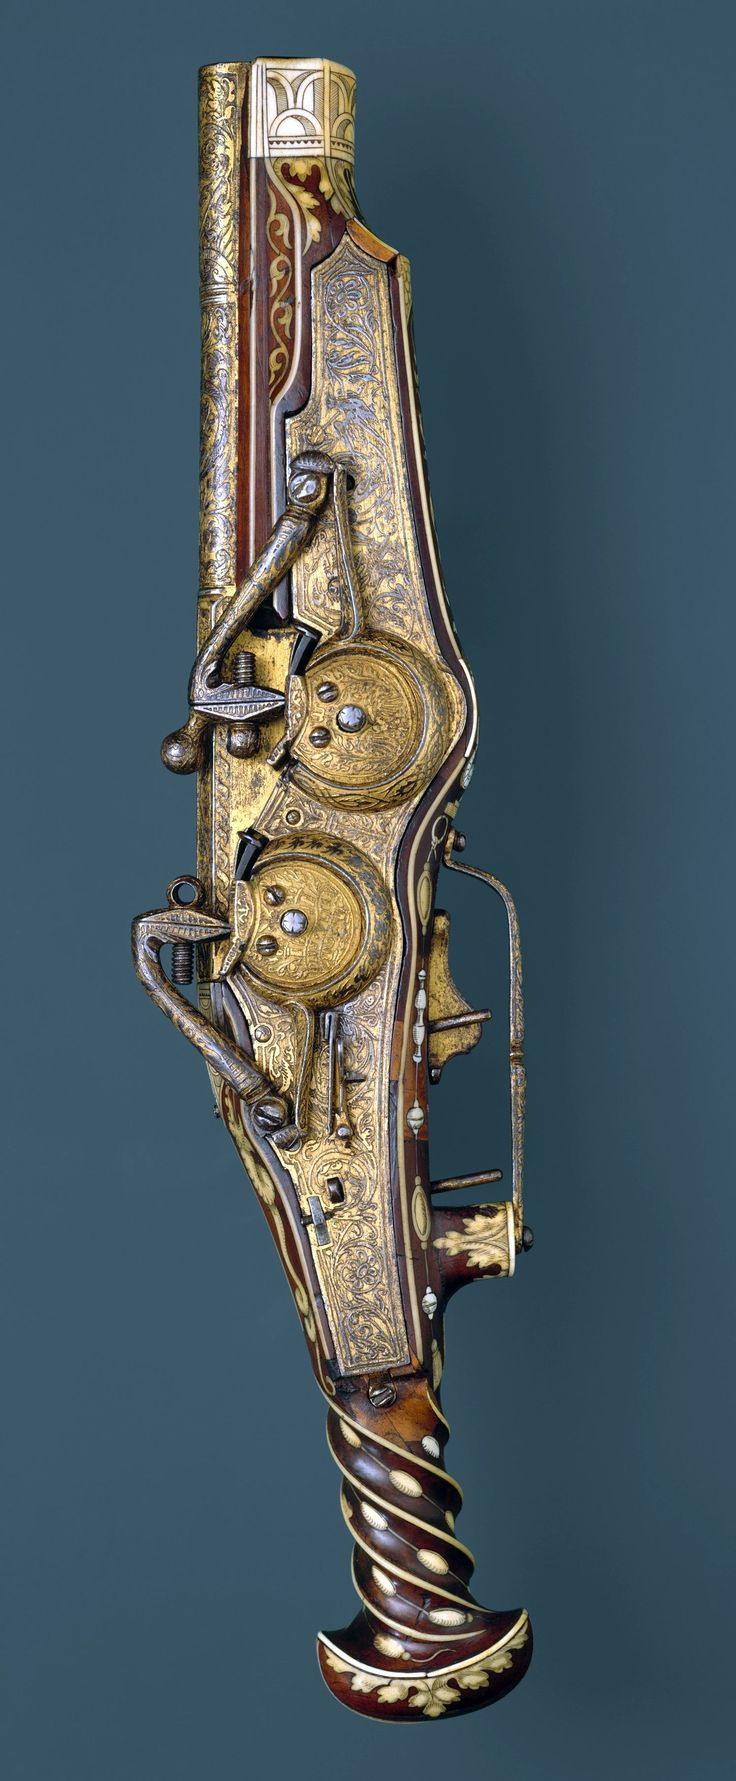 Double-Barreled Wheellock Pistol Made for Emperor Charles V (reigned 1519–56) Peter Peck (German, Munich, 1503–1596). Met Museum.